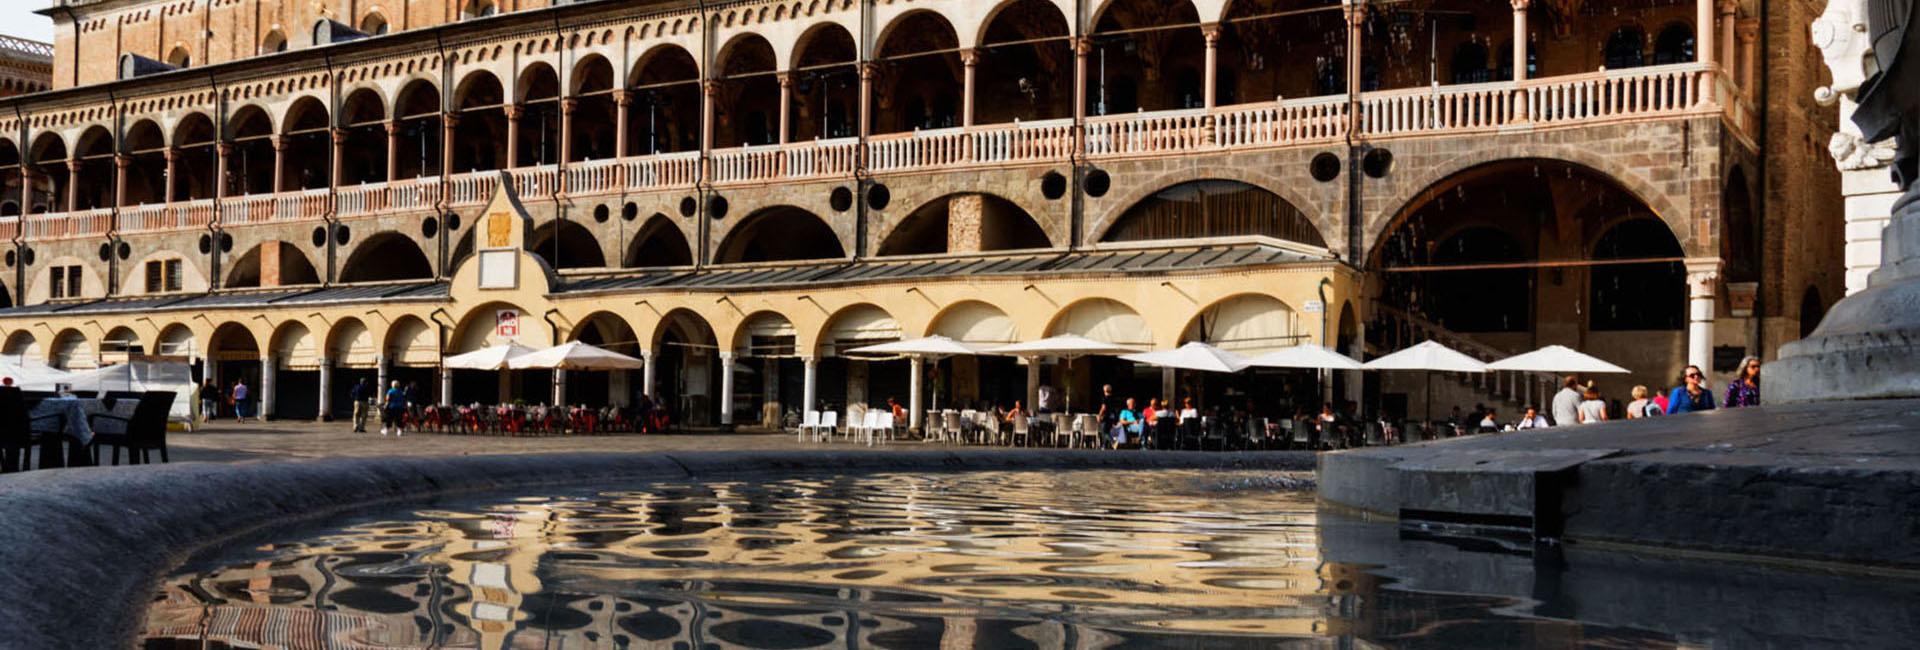 Padova Weekend ©Aldo Callegaro